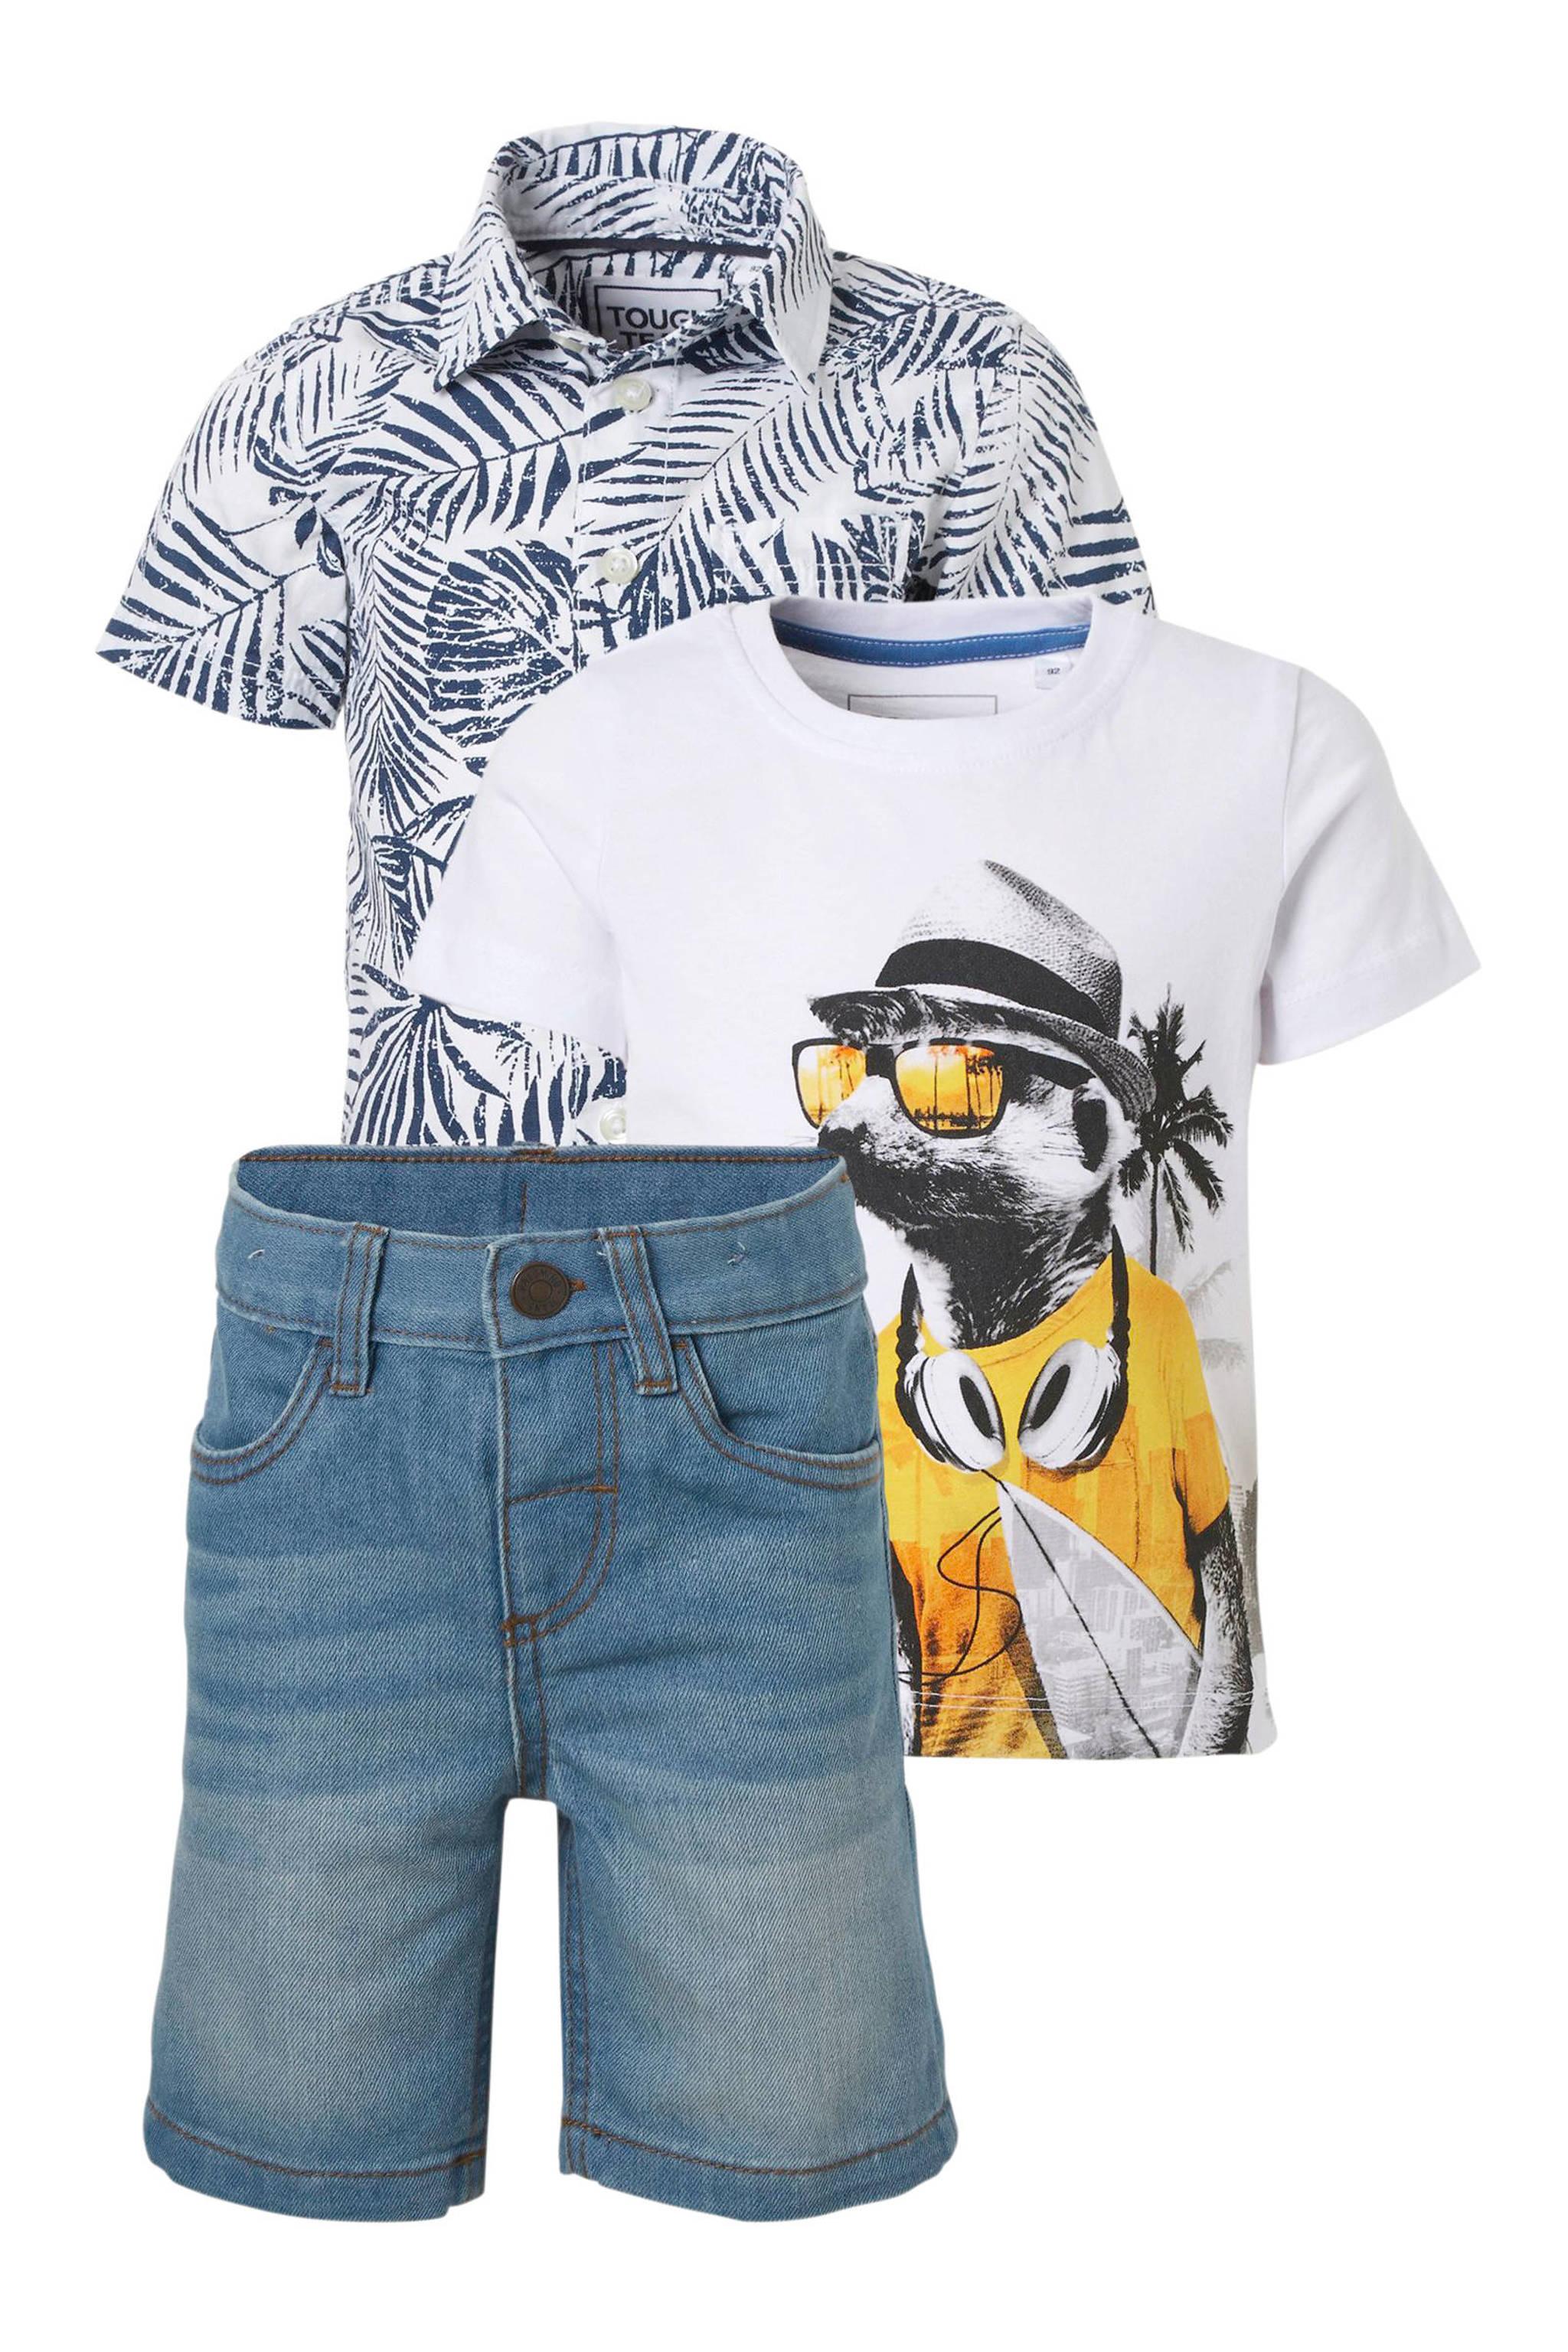 T Shirt Overhemd.C A Palomino Overhemd T Shirt Jeans Short Wehkamp